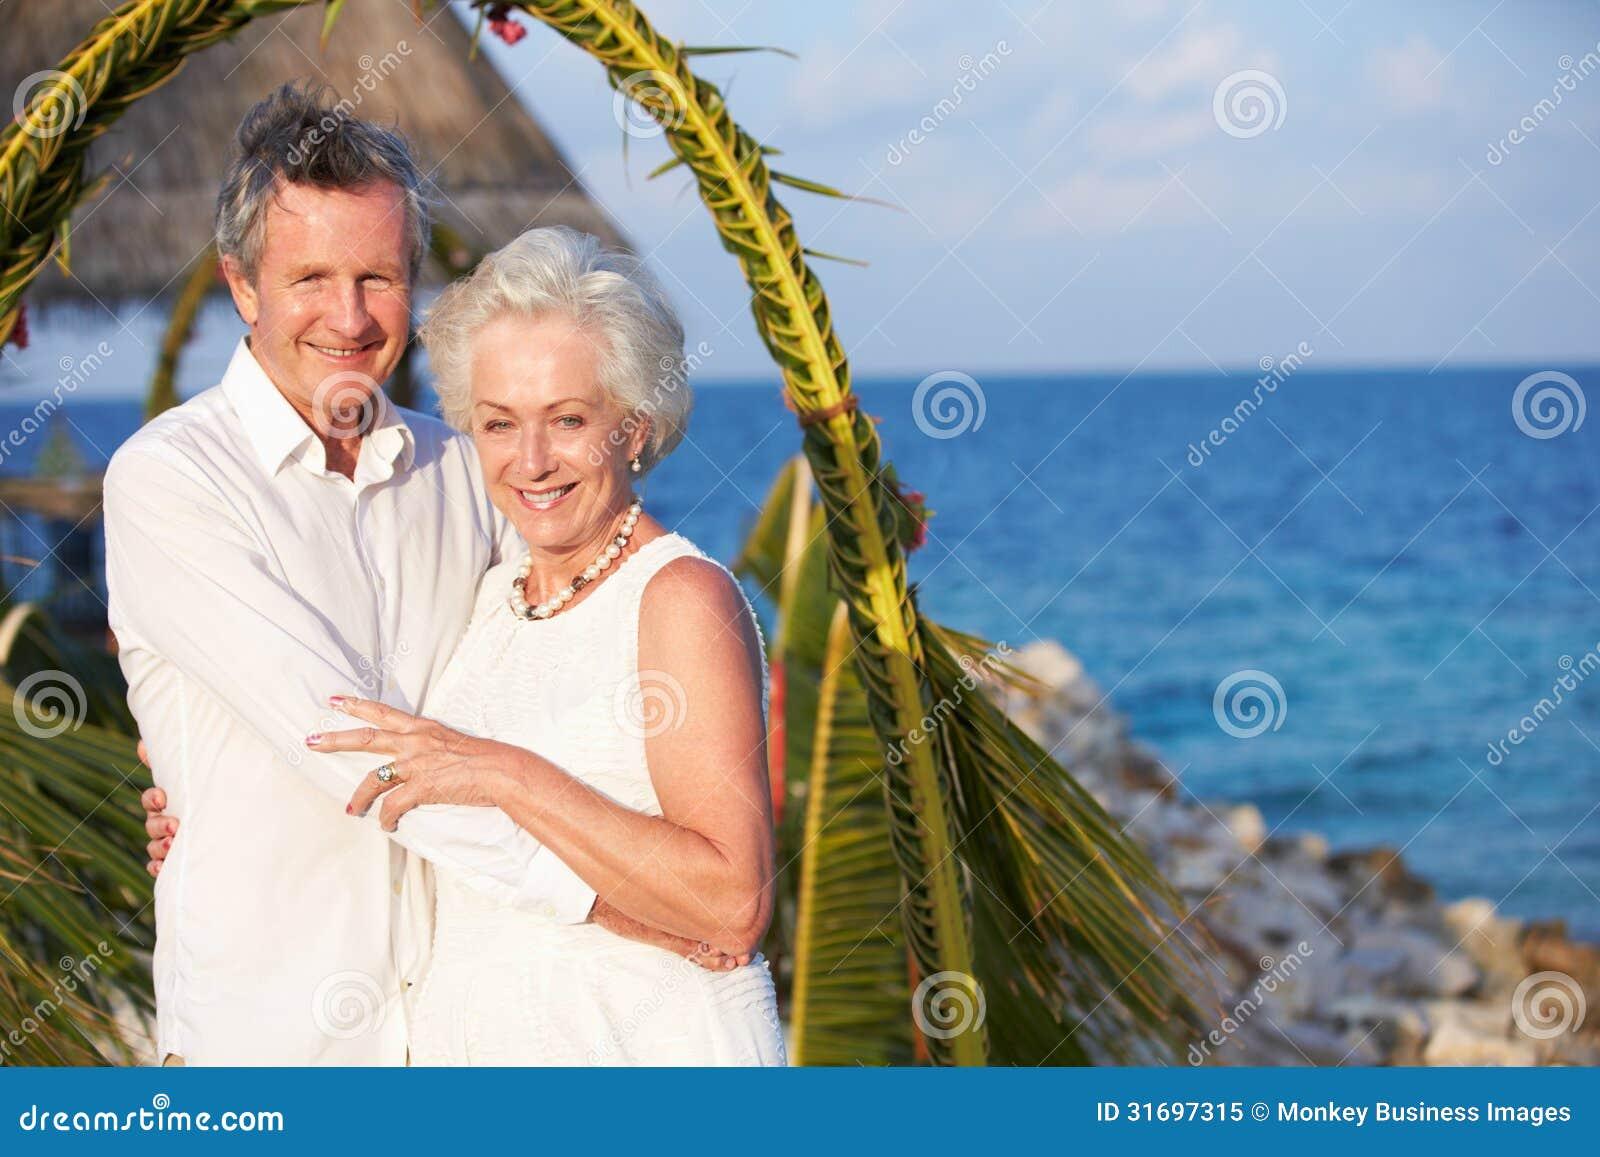 People looking to get married